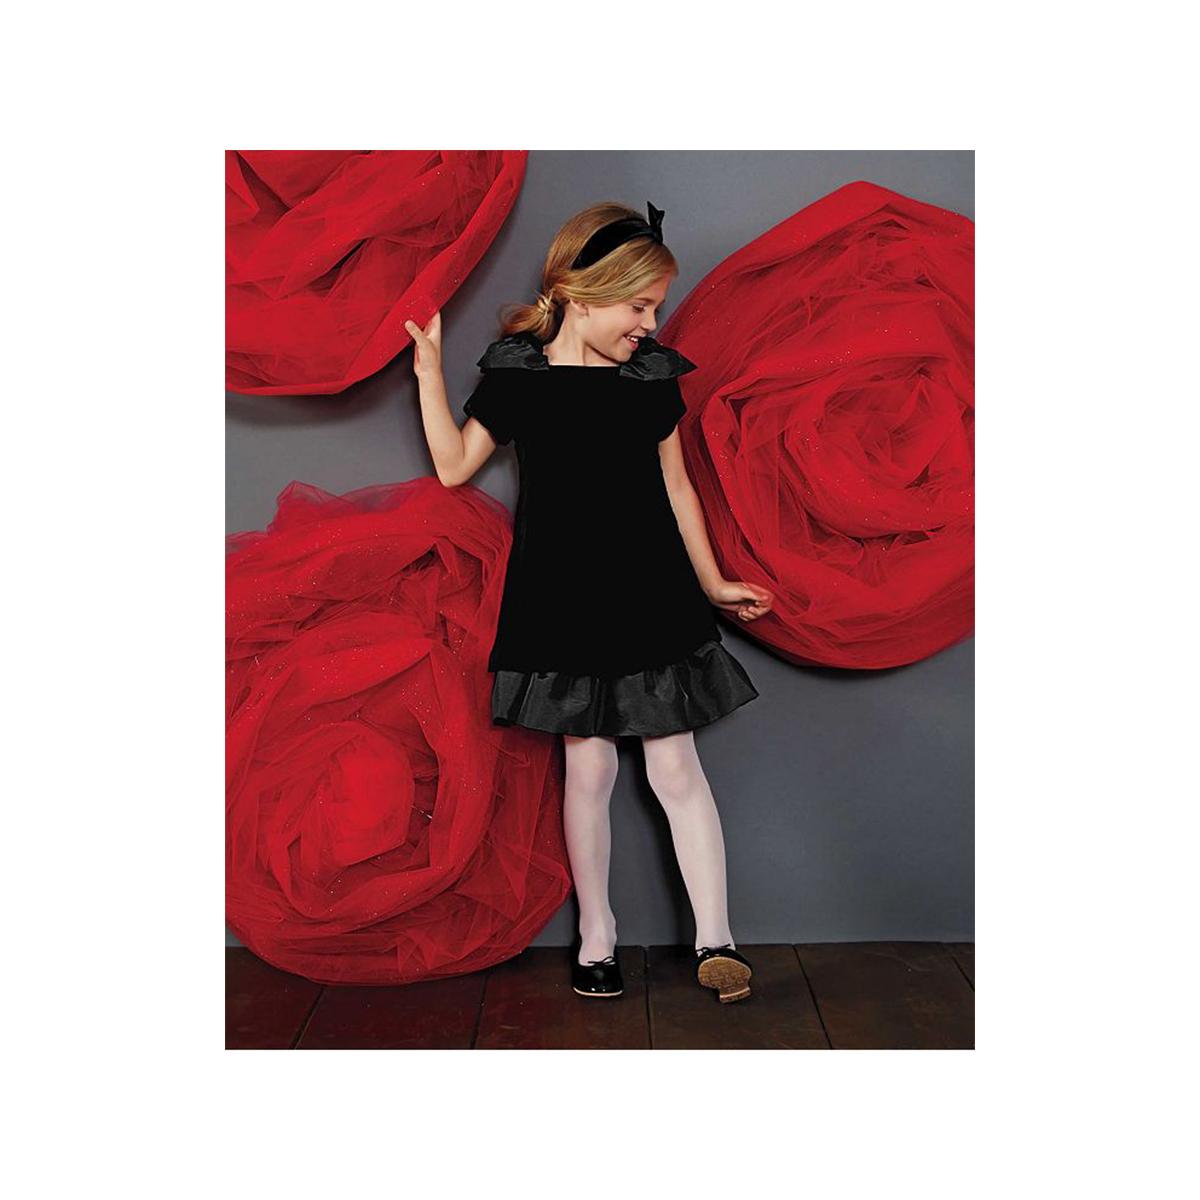 de8dd2772a87f 子供 ドレス ベルベット 高級 上質 黒 フリル ワンピース 女の子 発表会 衣装 フォーマル  通常便なら送料無料 豊富なサイズ展開 発表会に